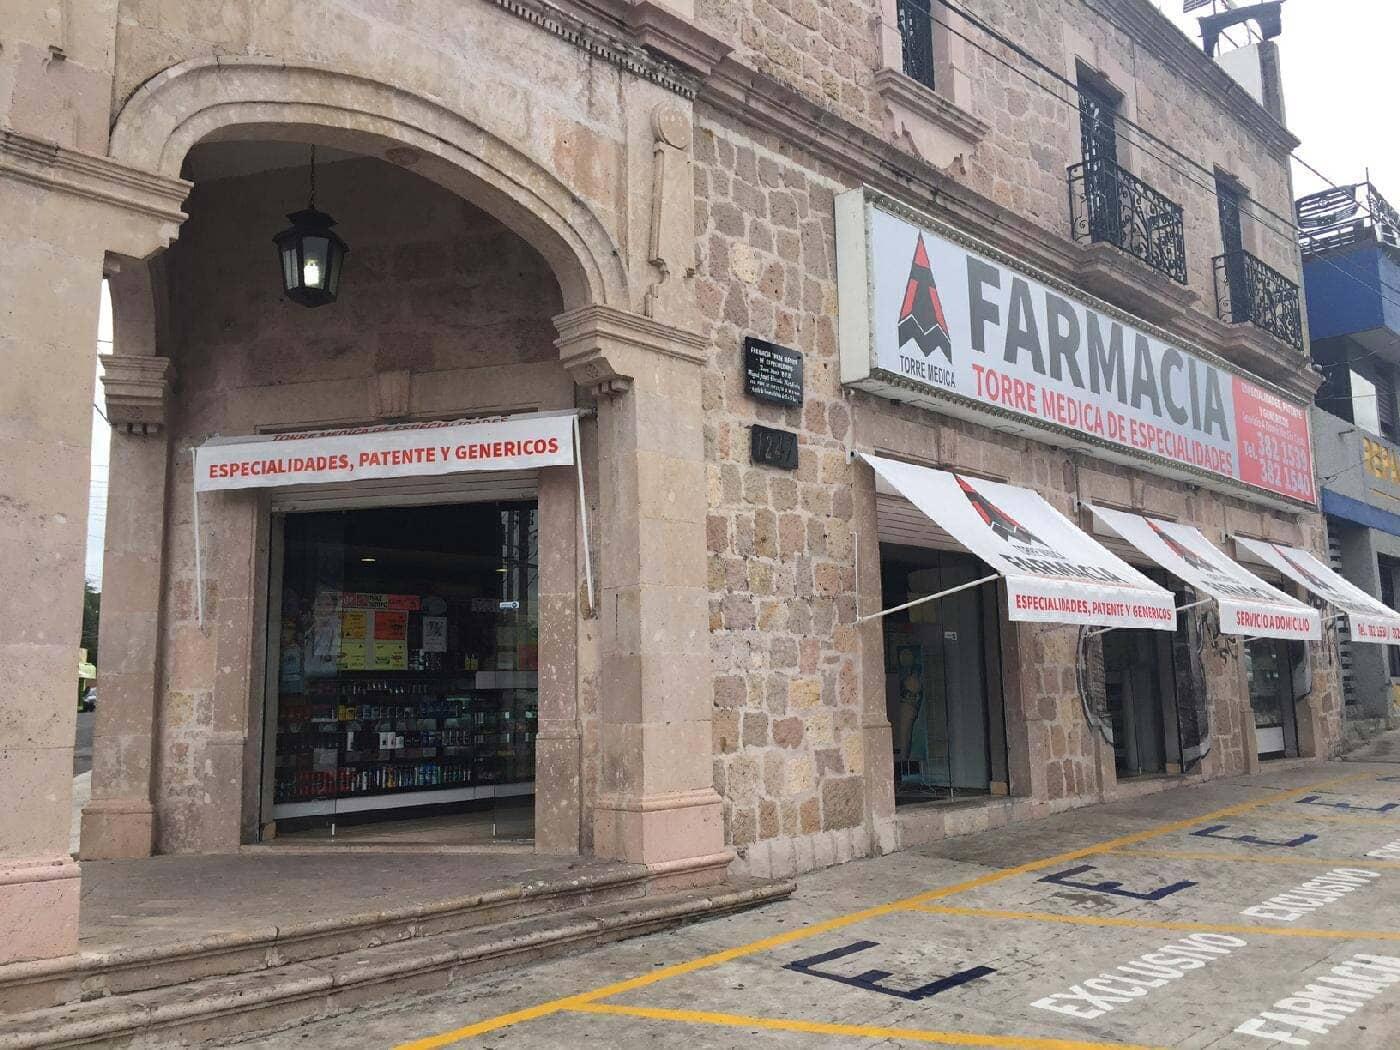 FARMACIA TORRE MÉDICA DE ESPECIALIDADES - Farmacia Torre Médica de Especialidades